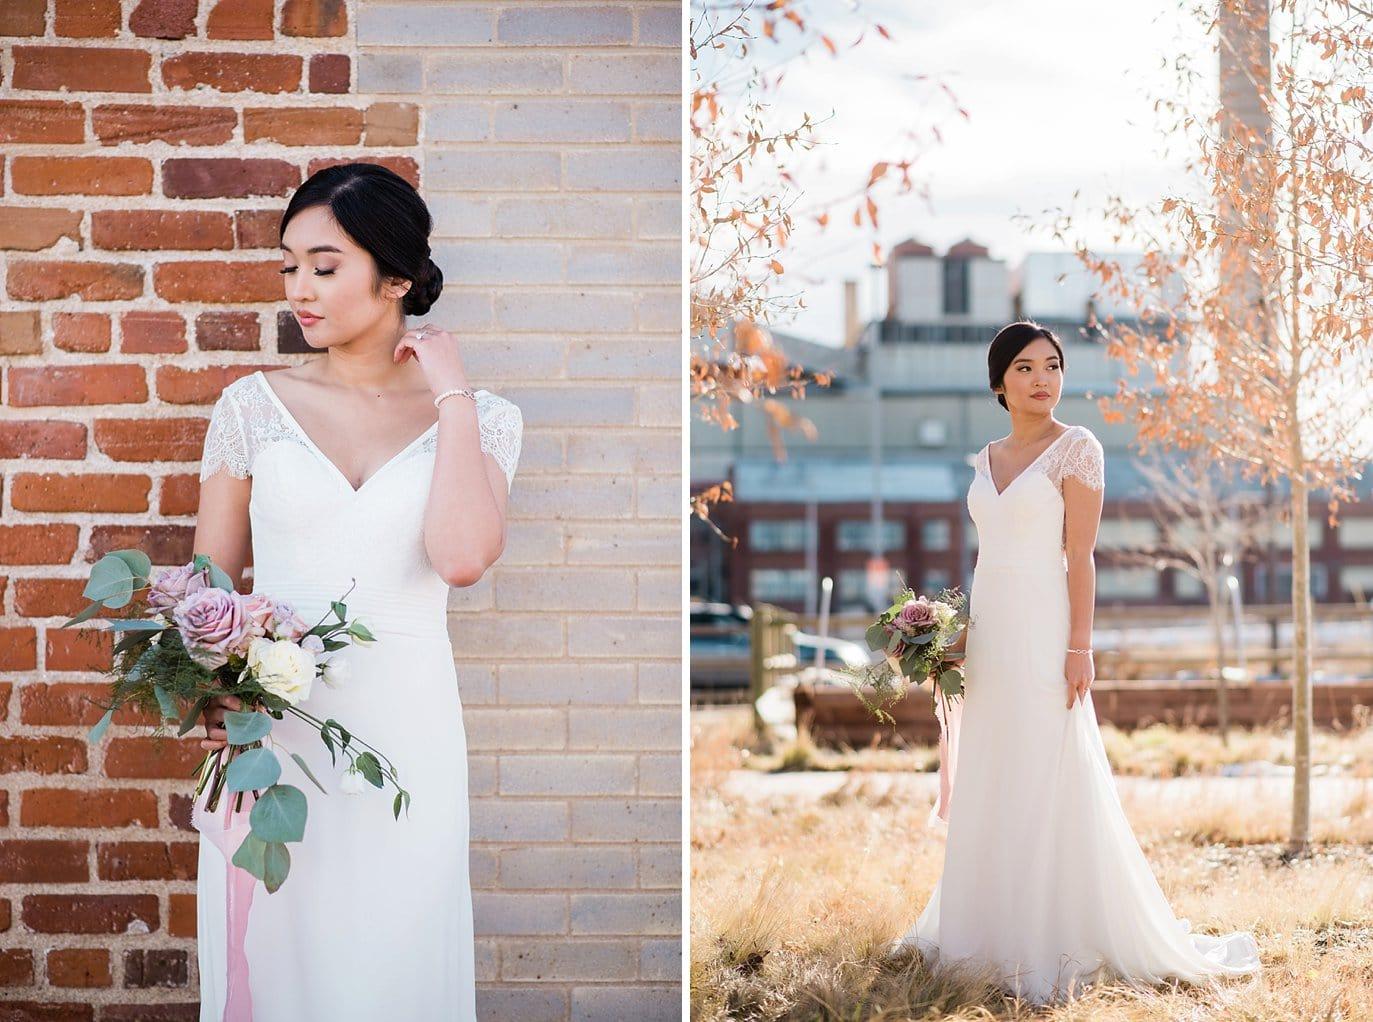 bride in sleek classy wedding dress by brick wall at Shyft Denver wedding by Boulder Wedding photographer Jennie Crate photographer